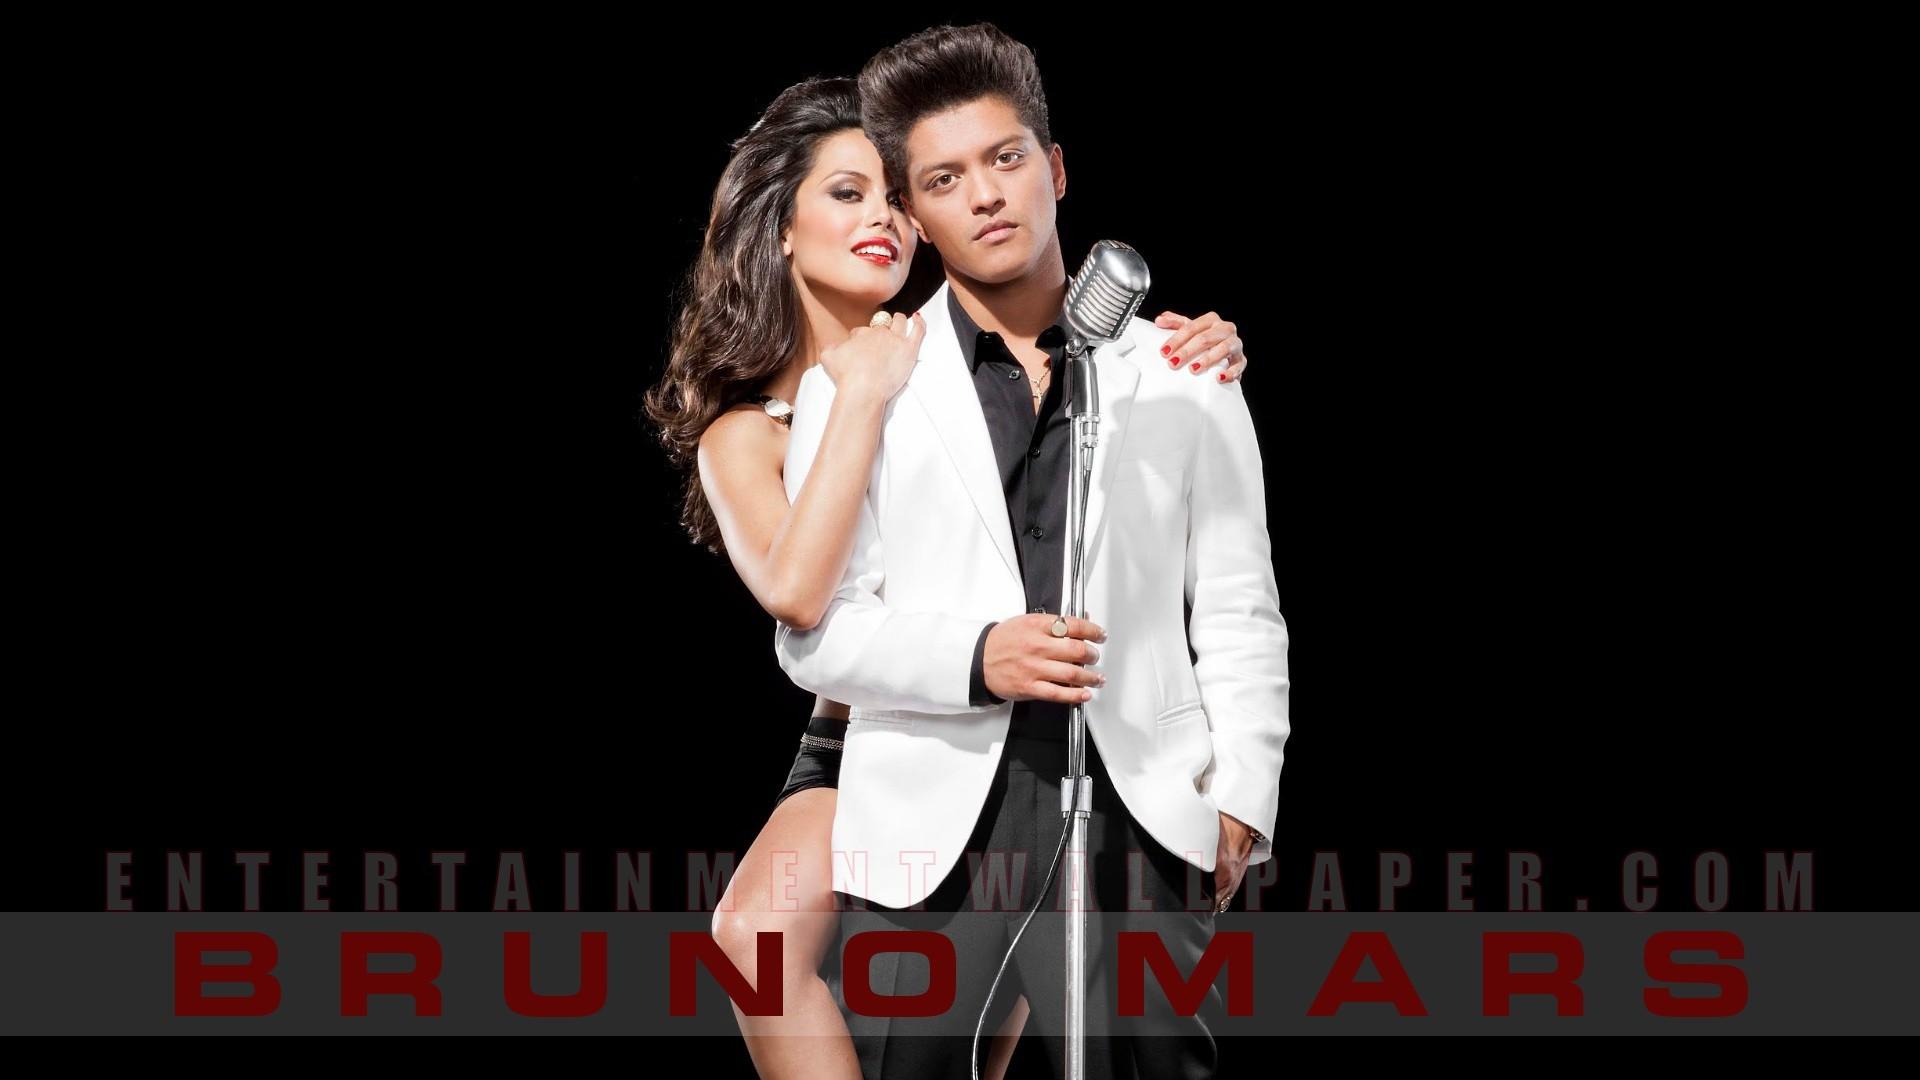 Bruno Mars Wallpaper - Bruno Mars Playboy Magazine - HD Wallpaper